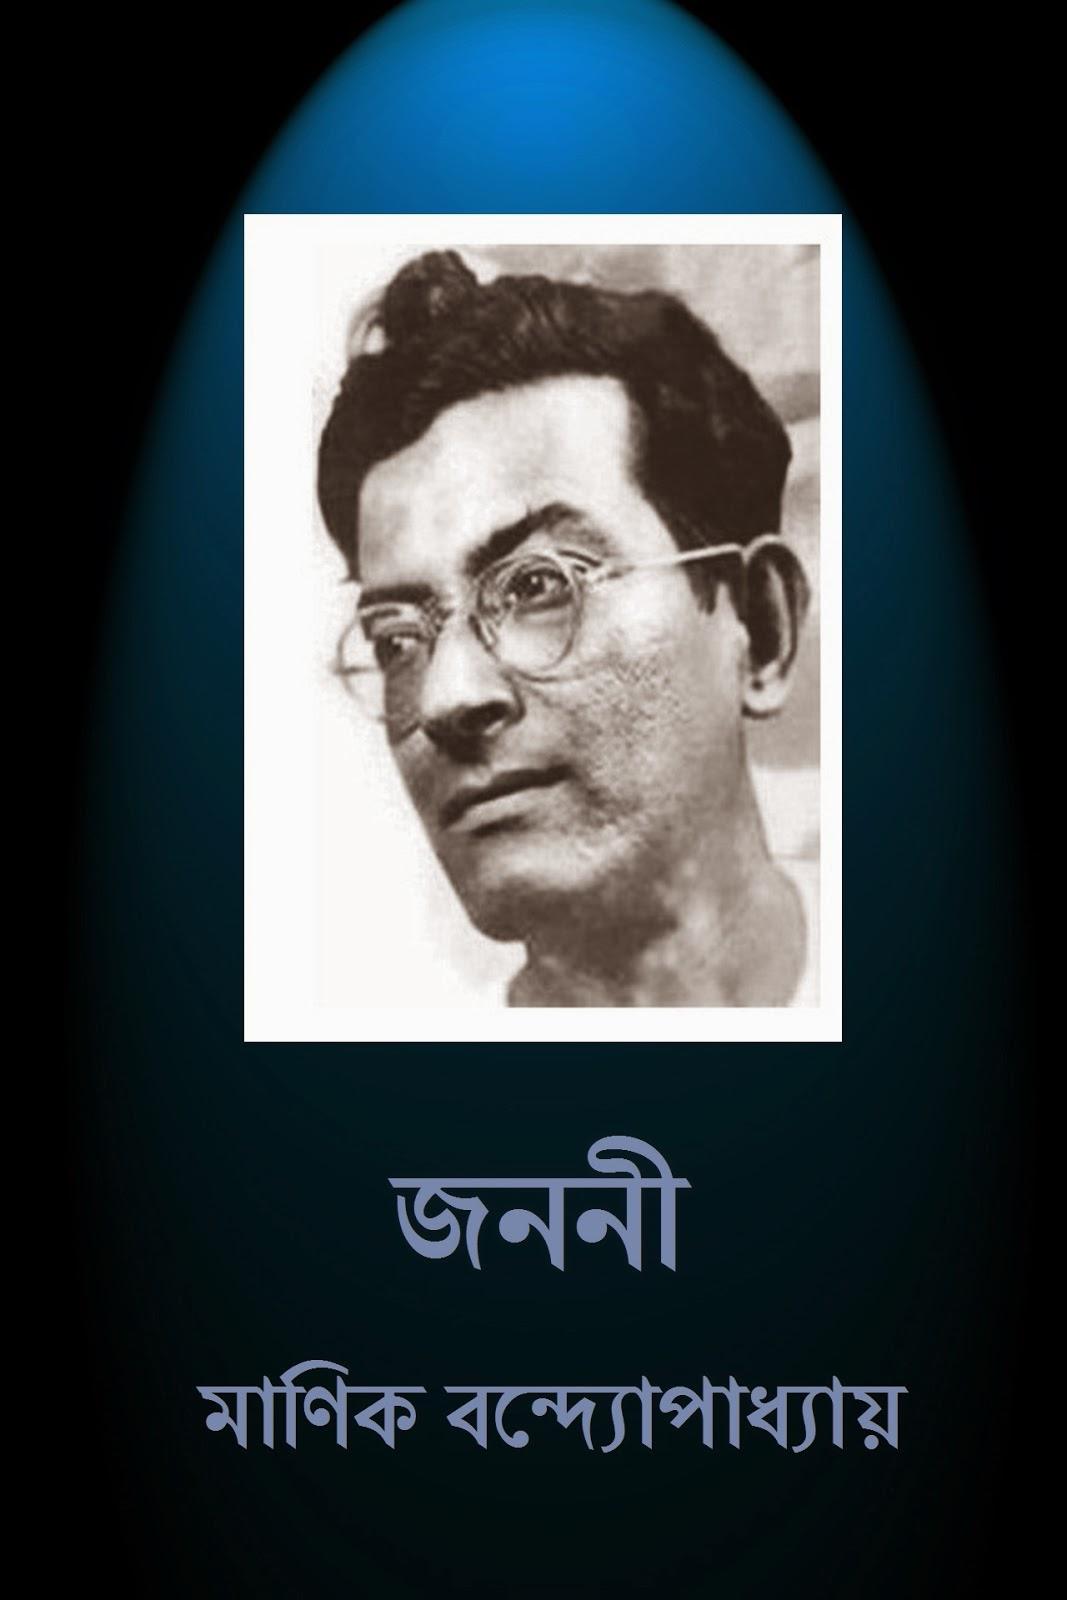 http://www.mediafire.com/download/to9m7hqyrskr1l6/Janani+-+Manik+Bandyopadhyay.pdf